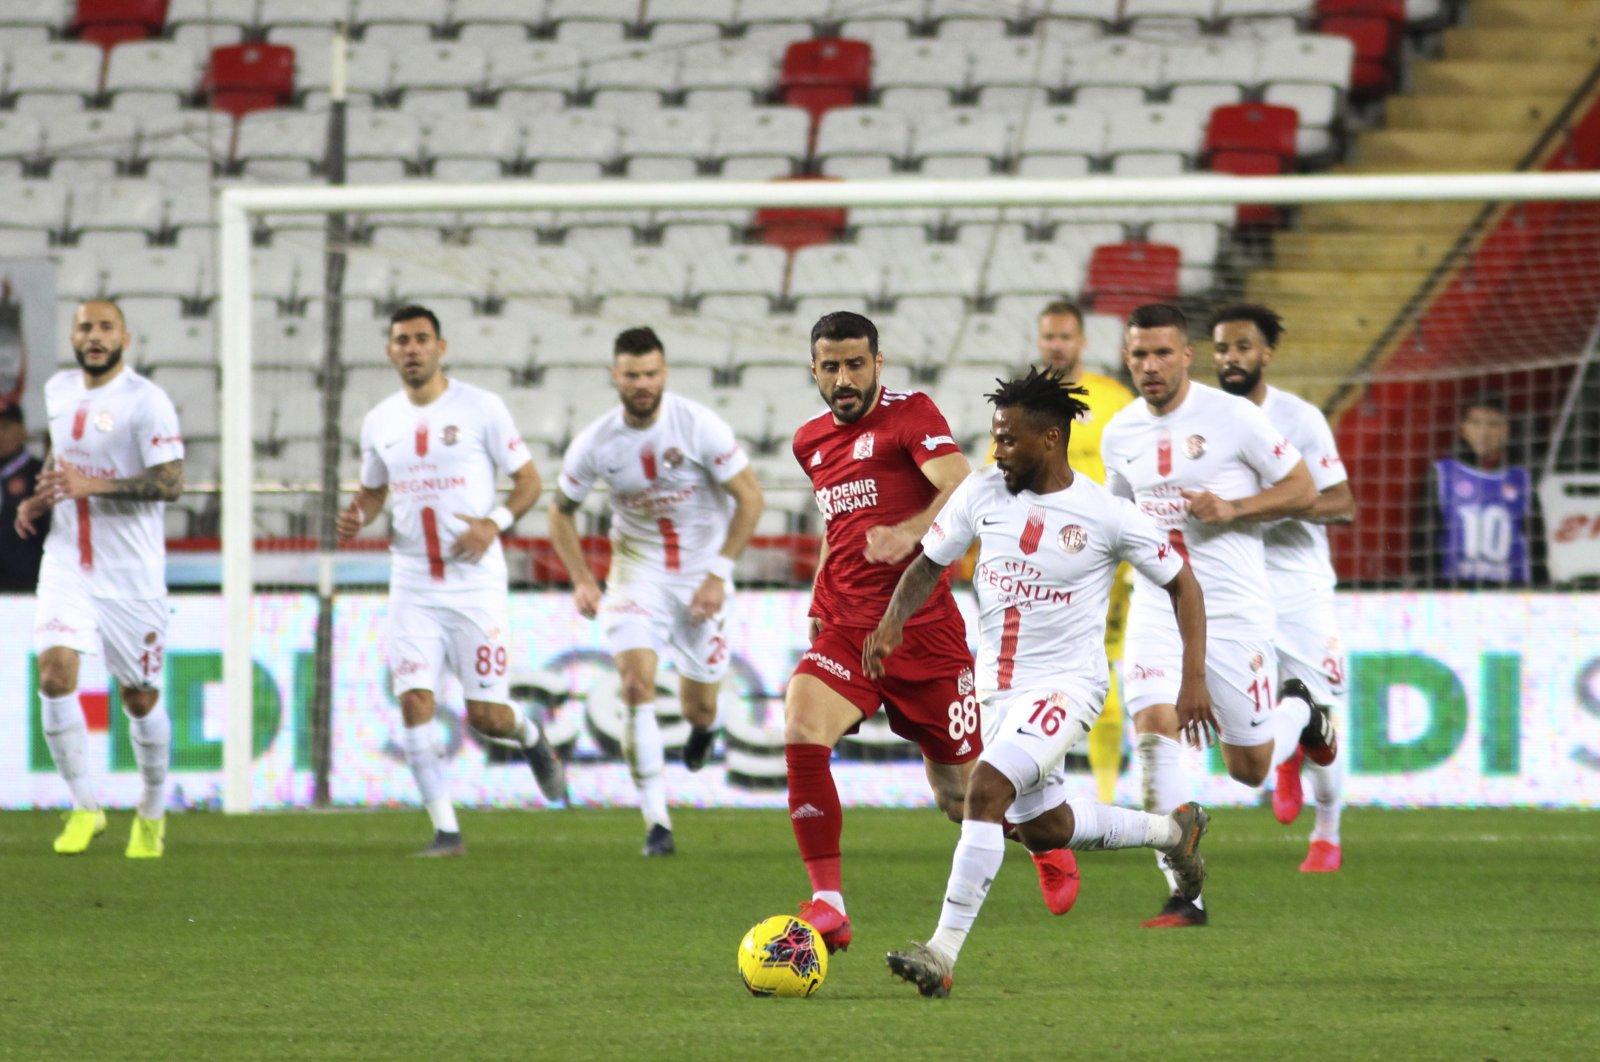 Antalyaspor's Alfredo Kulembe Ribeiro (R) controls the ball in front of Sivasspor's Caner Osmanpaşa during a Süper Lig match in Antalya, Turkey, March 16, 2020. (AP Photo)